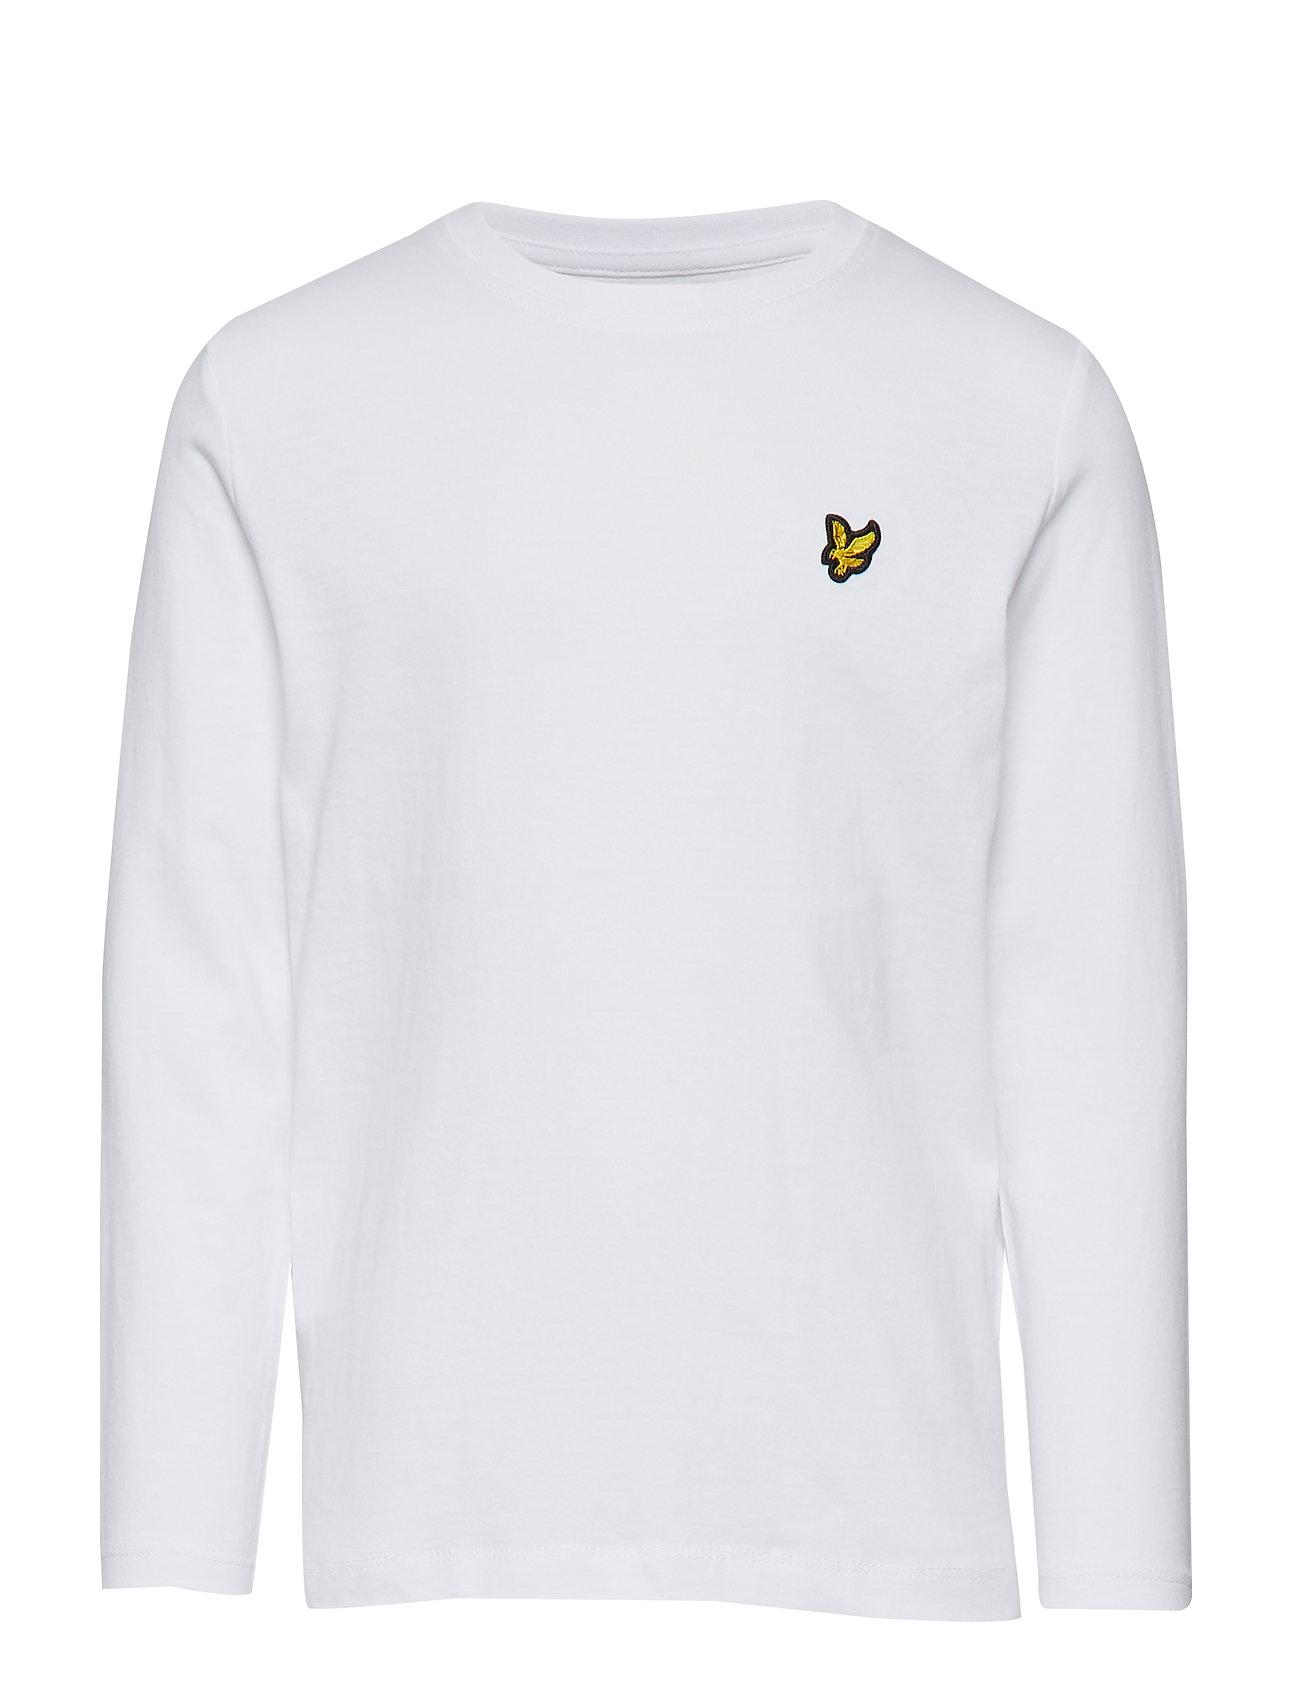 Lyle & Scott Junior Classic L/S T-Shirt - BRIGHT WHITE